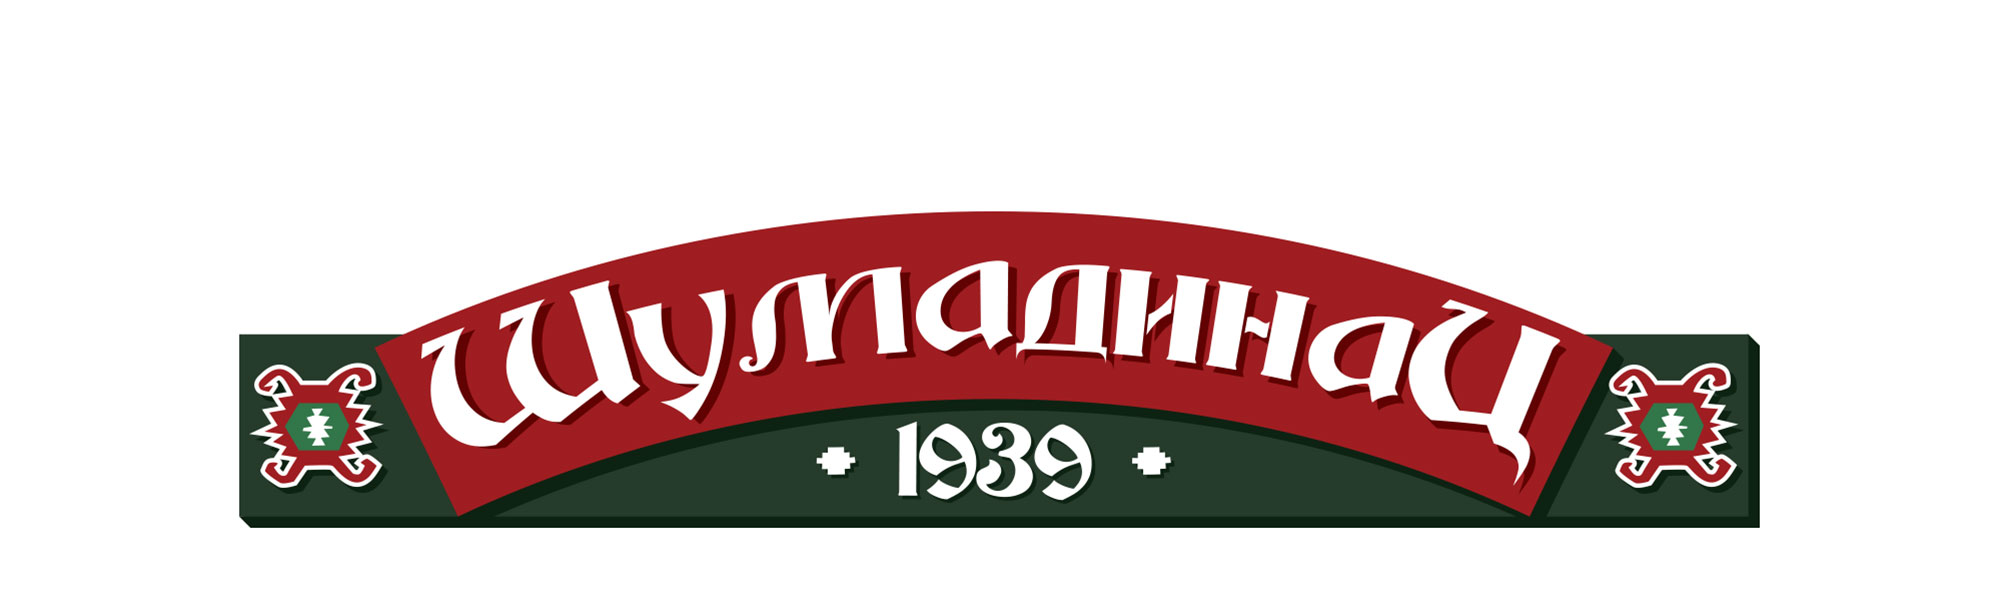 sumadinac logo 1